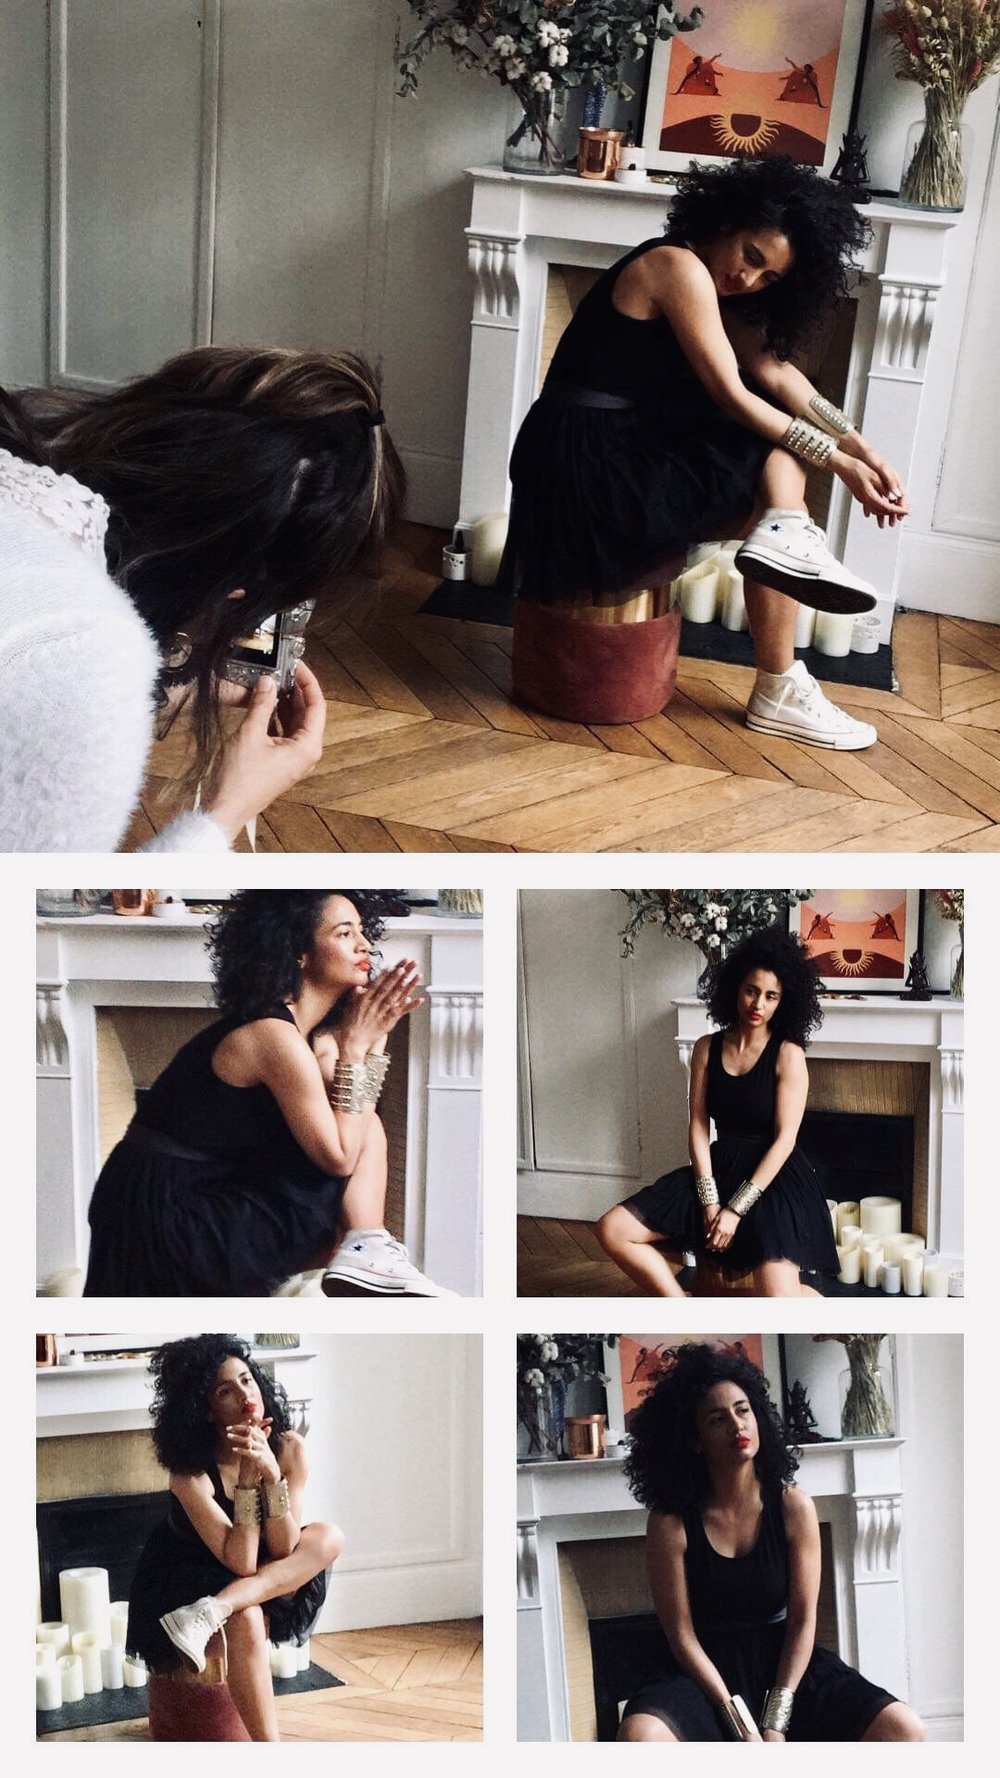 Backstage Shooting Collection - Muse Tutu : Virginie DarbonPhotographe : Amandine Galice